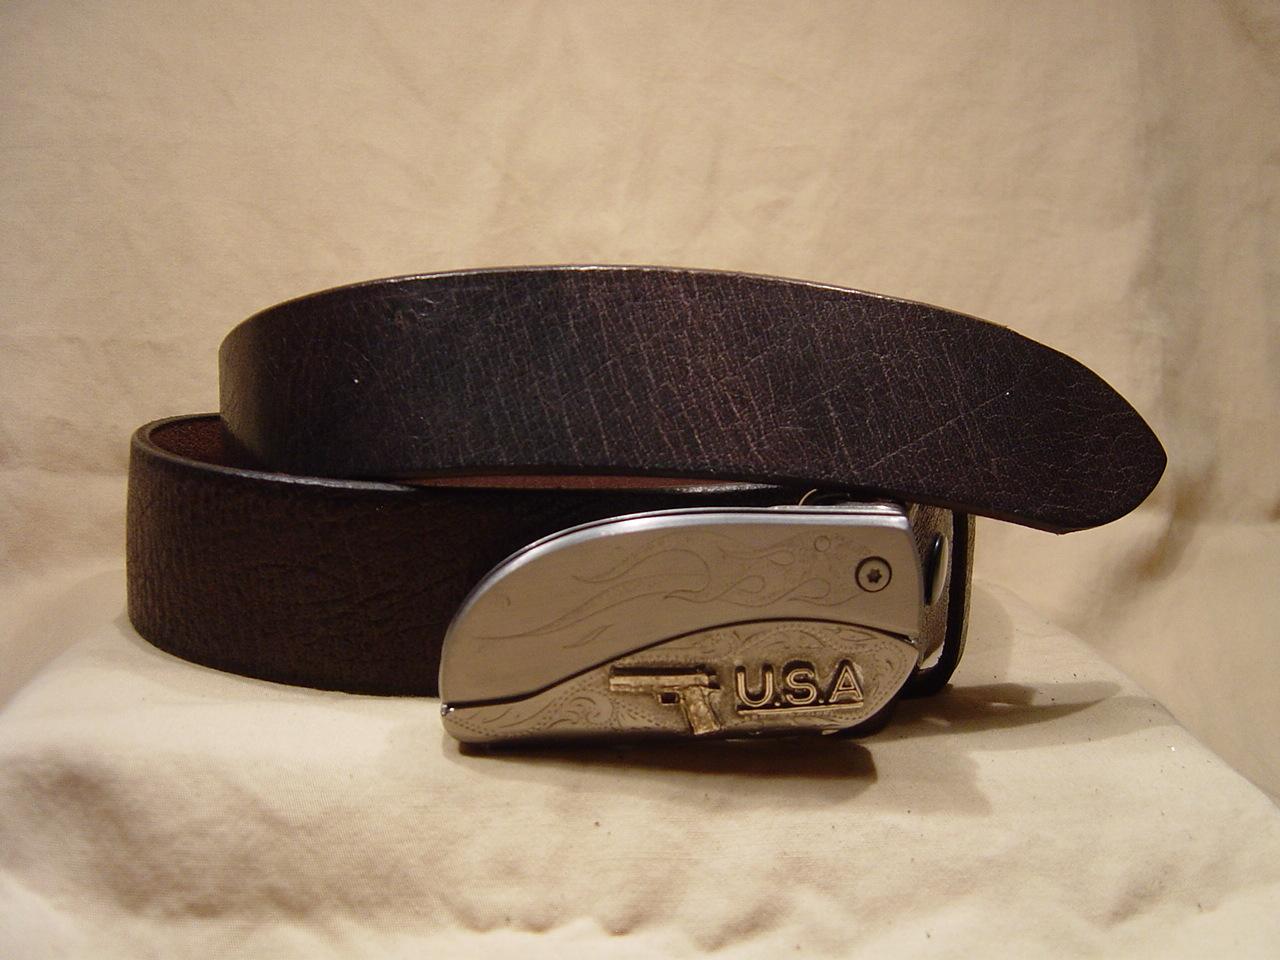 Antique brown leather belt with belt buckle knife